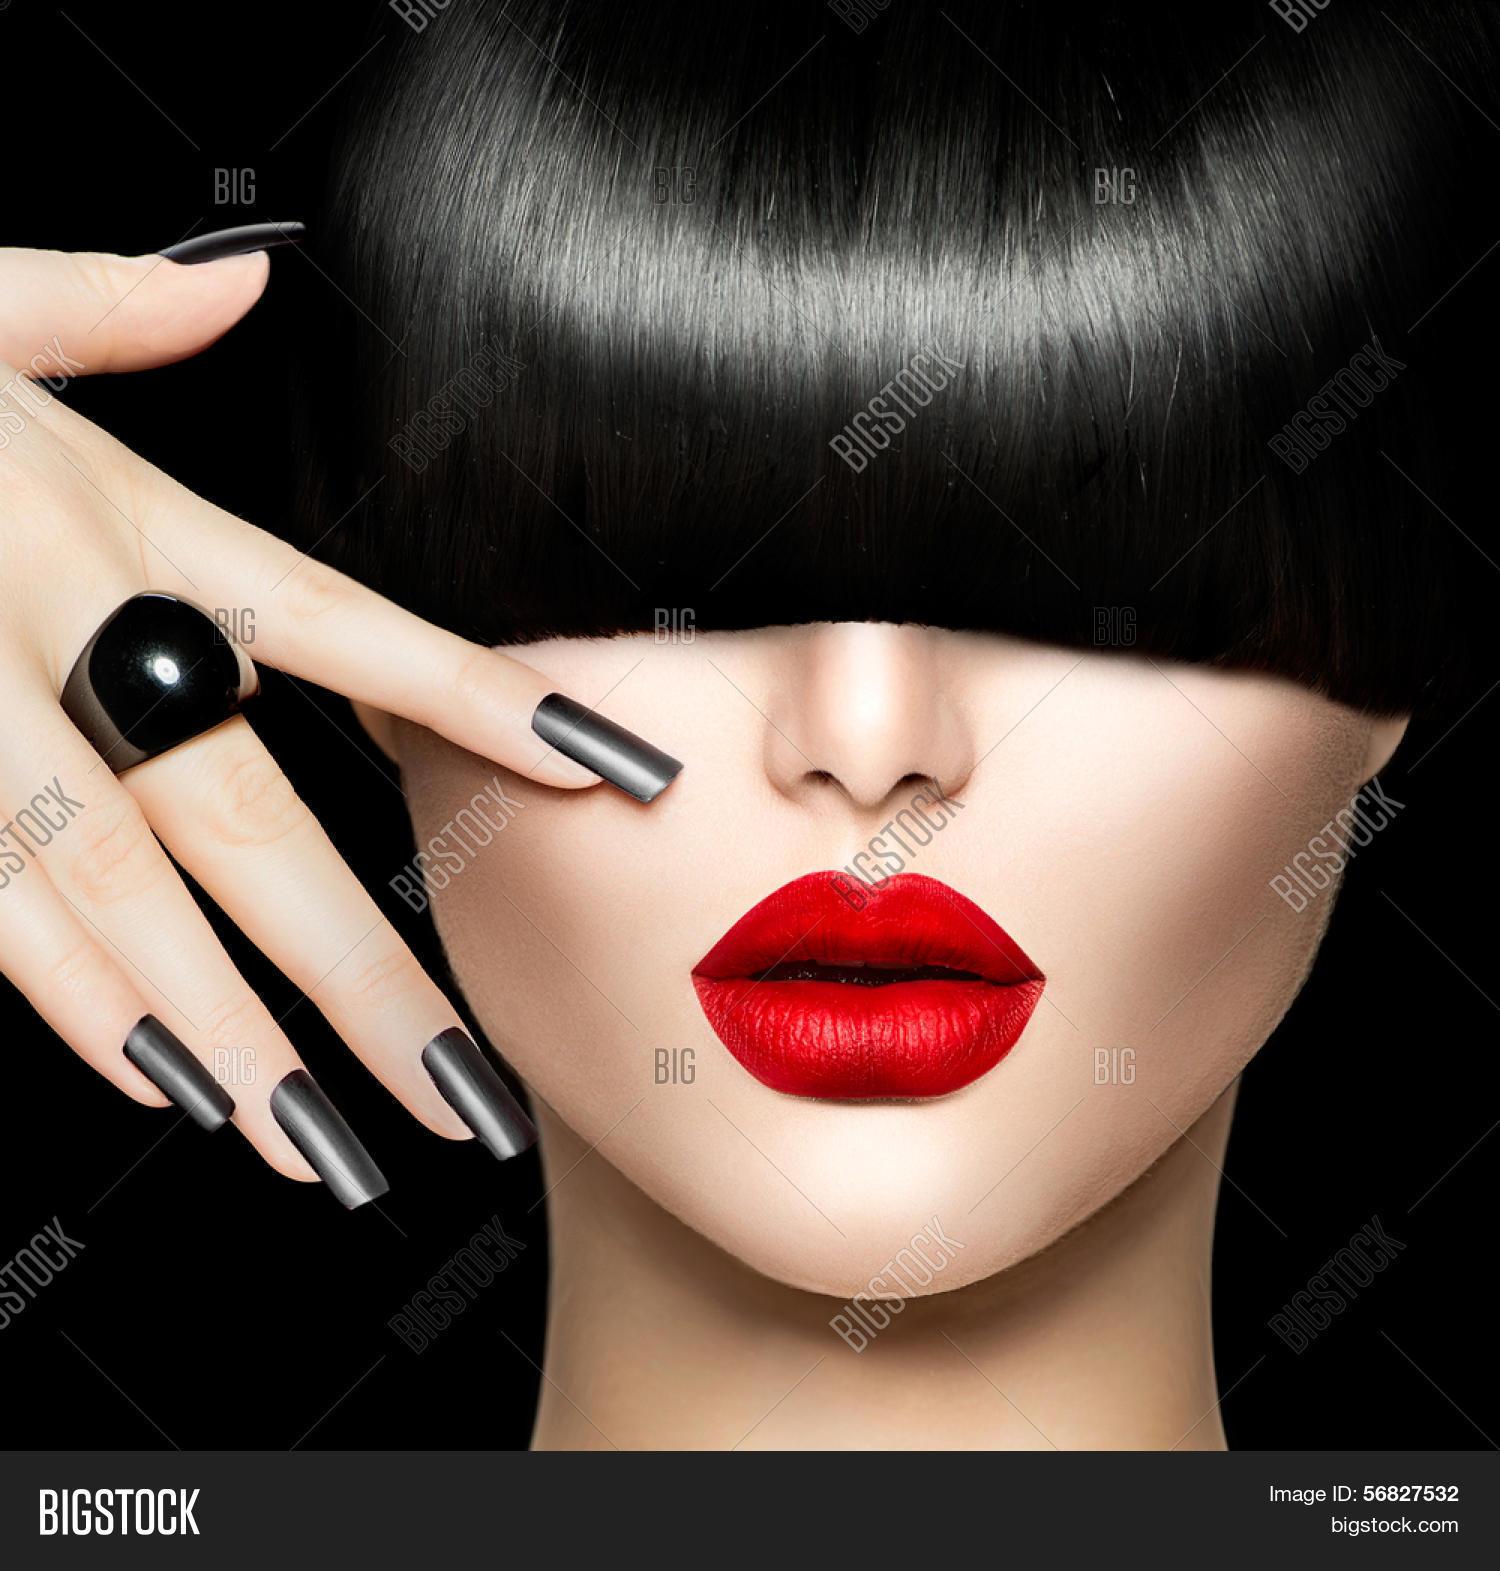 high fashion model girl portrait image photo bigstock. Black Bedroom Furniture Sets. Home Design Ideas